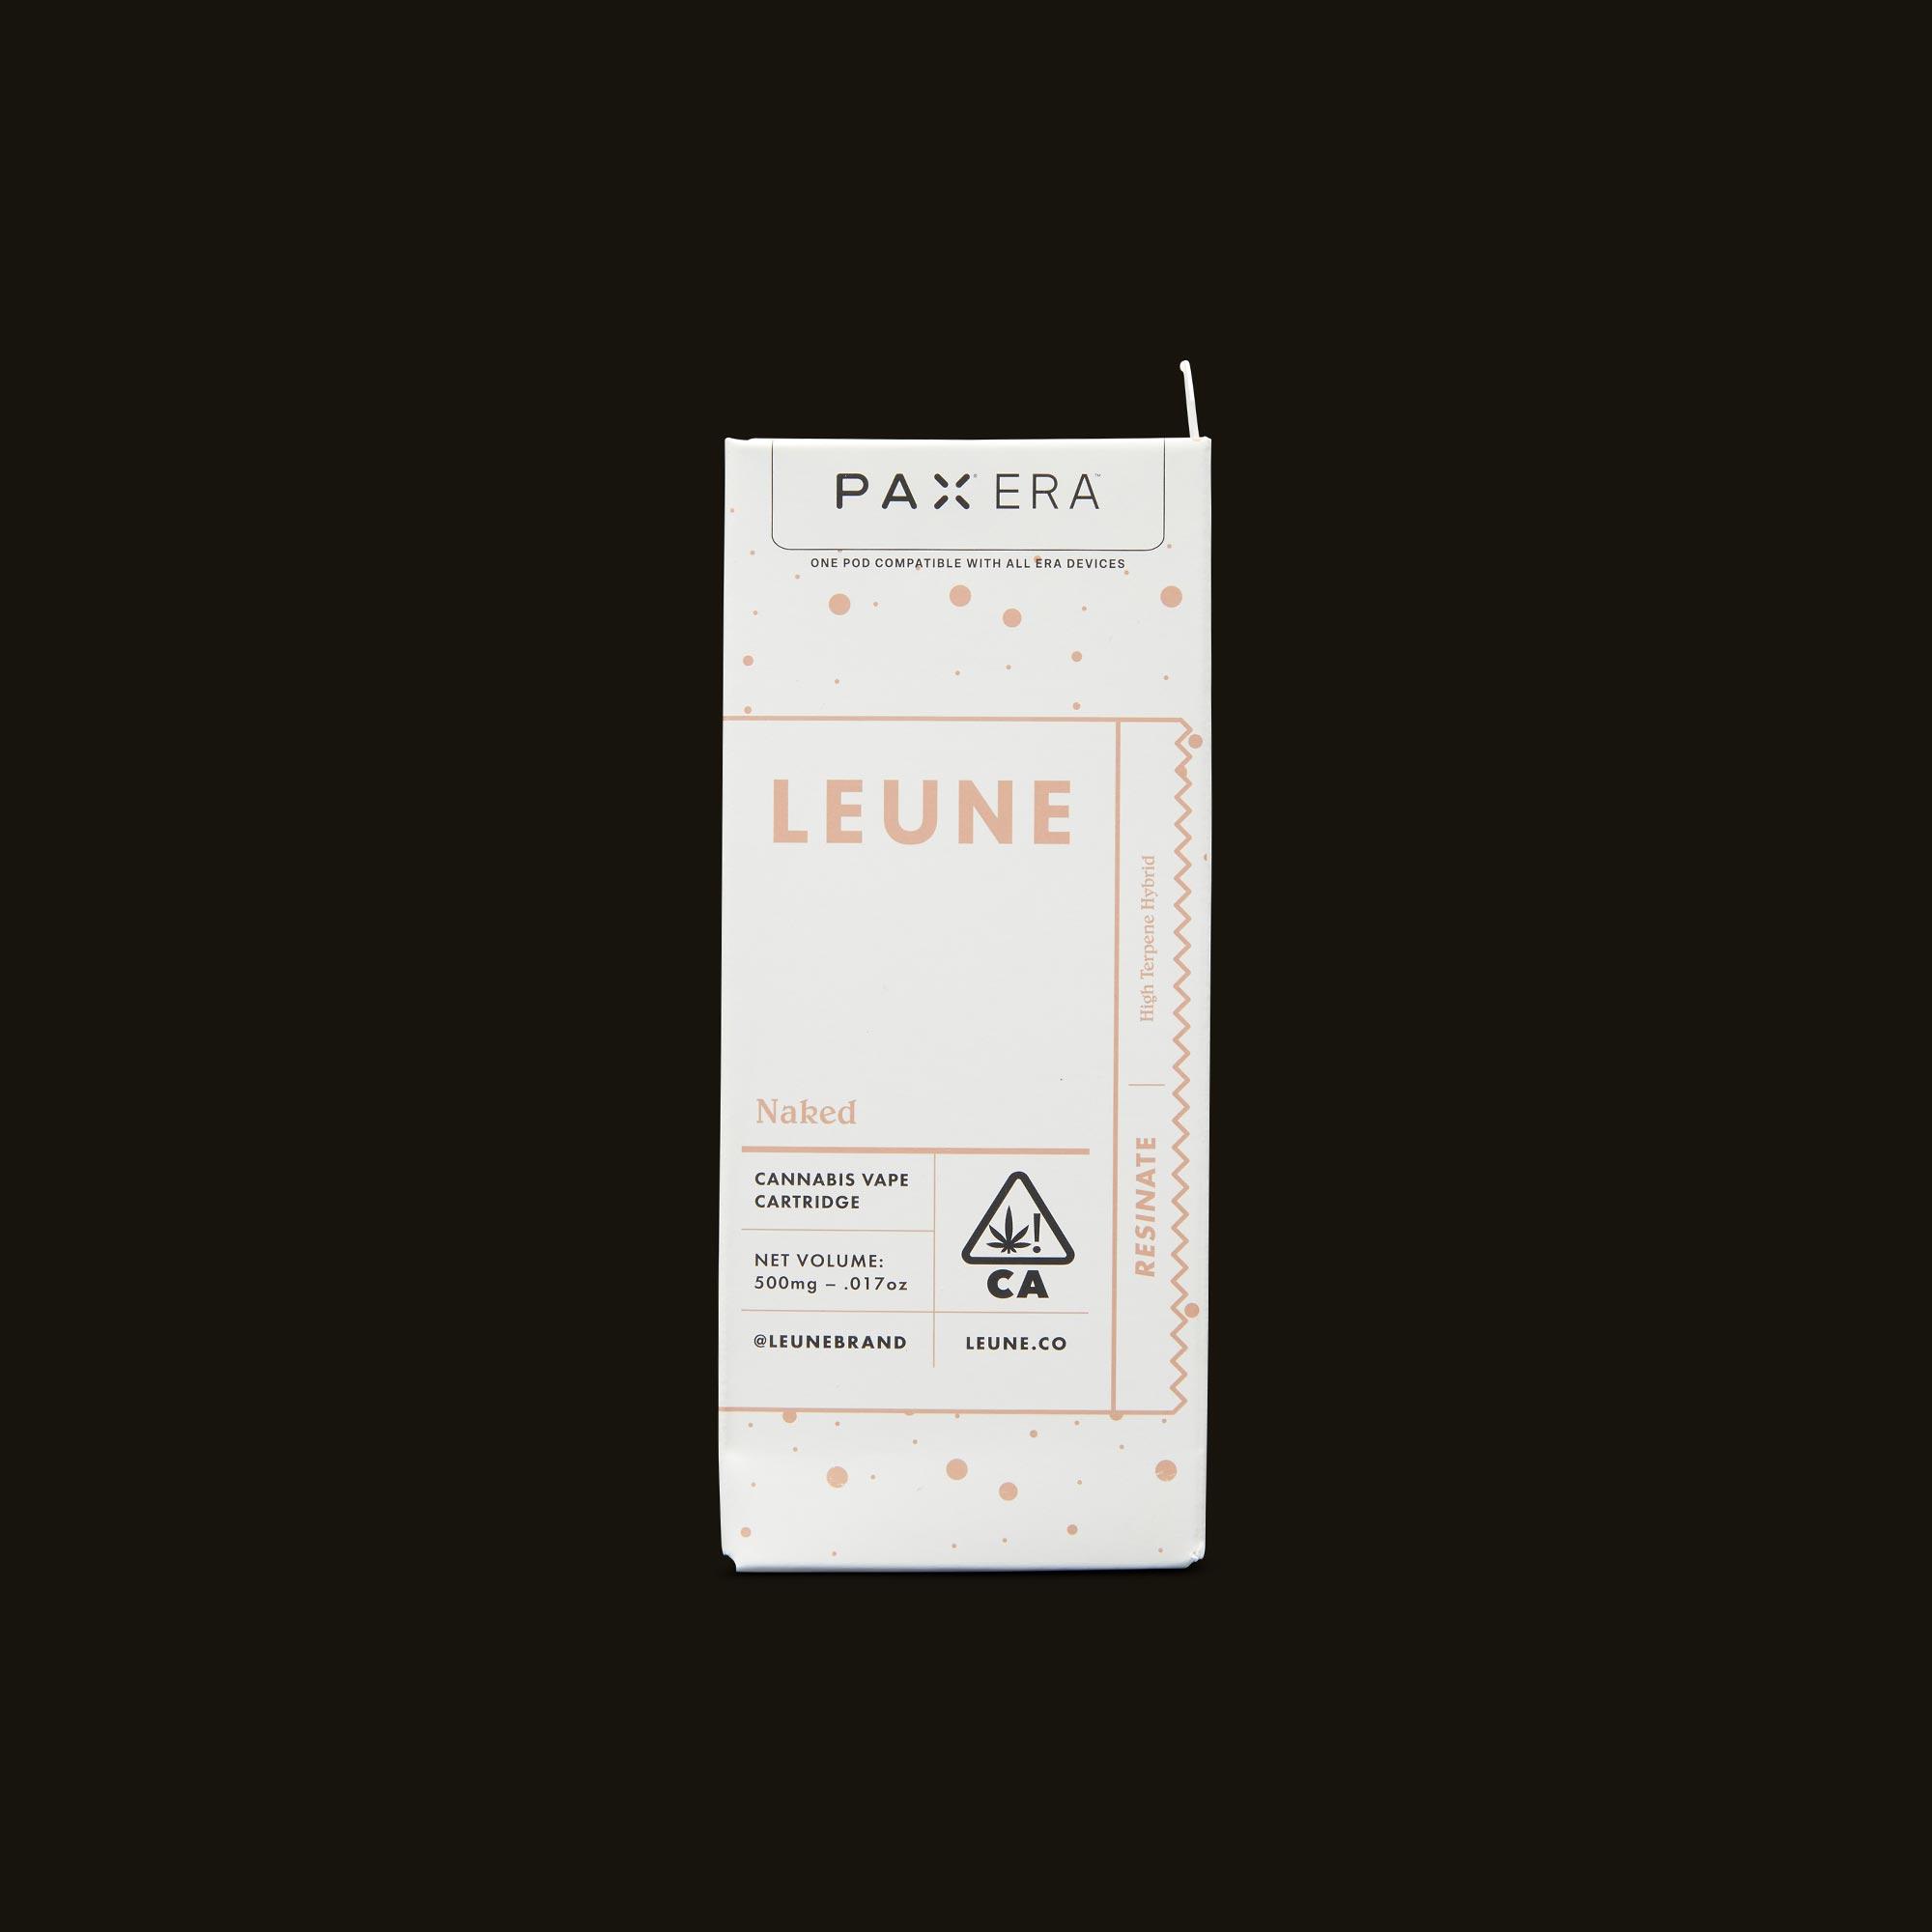 LEUNE Naked Tangie Live Resin PAX Era Pod Front Packaging